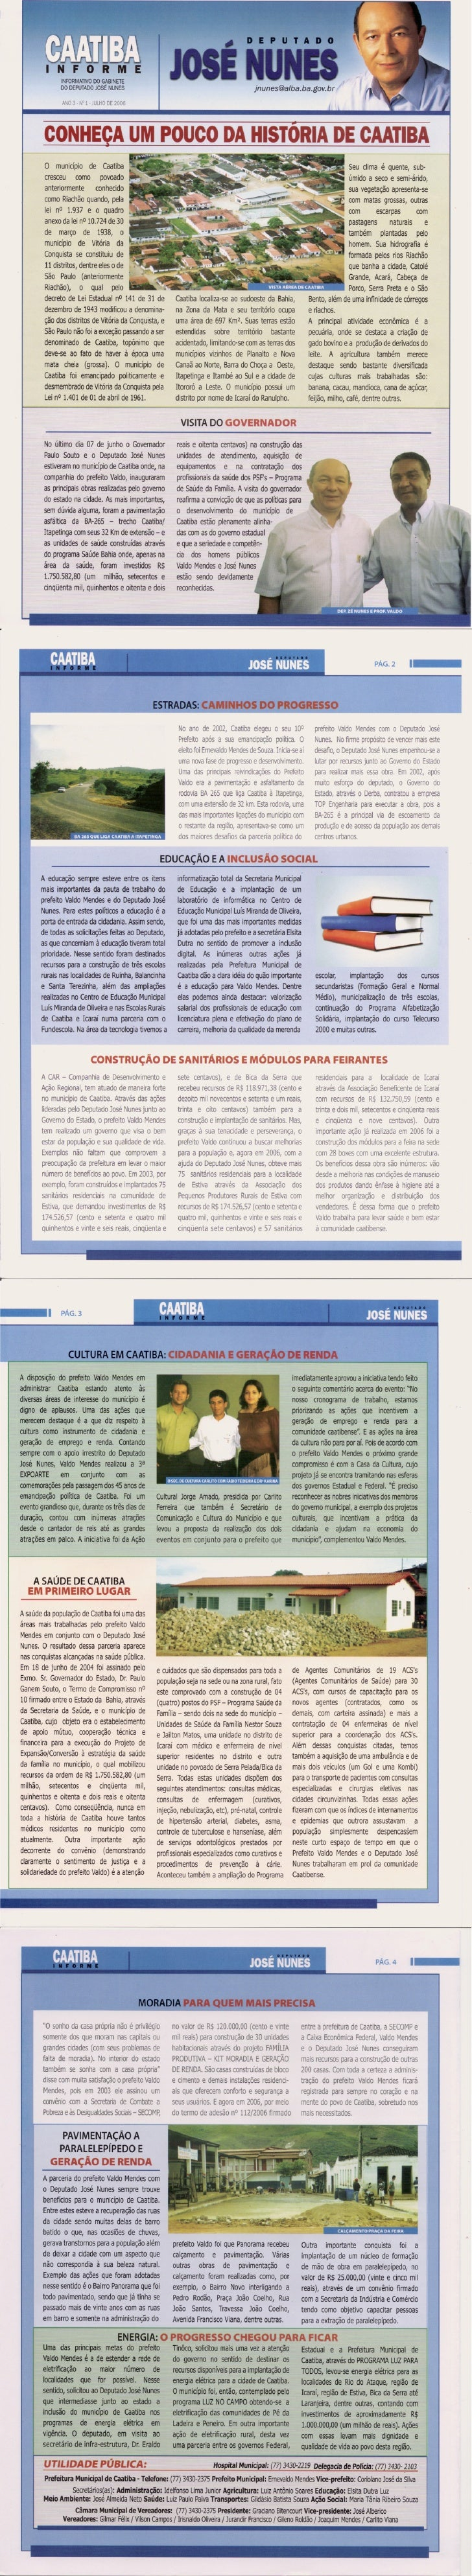 Boletim Informativo do município de Caatiba